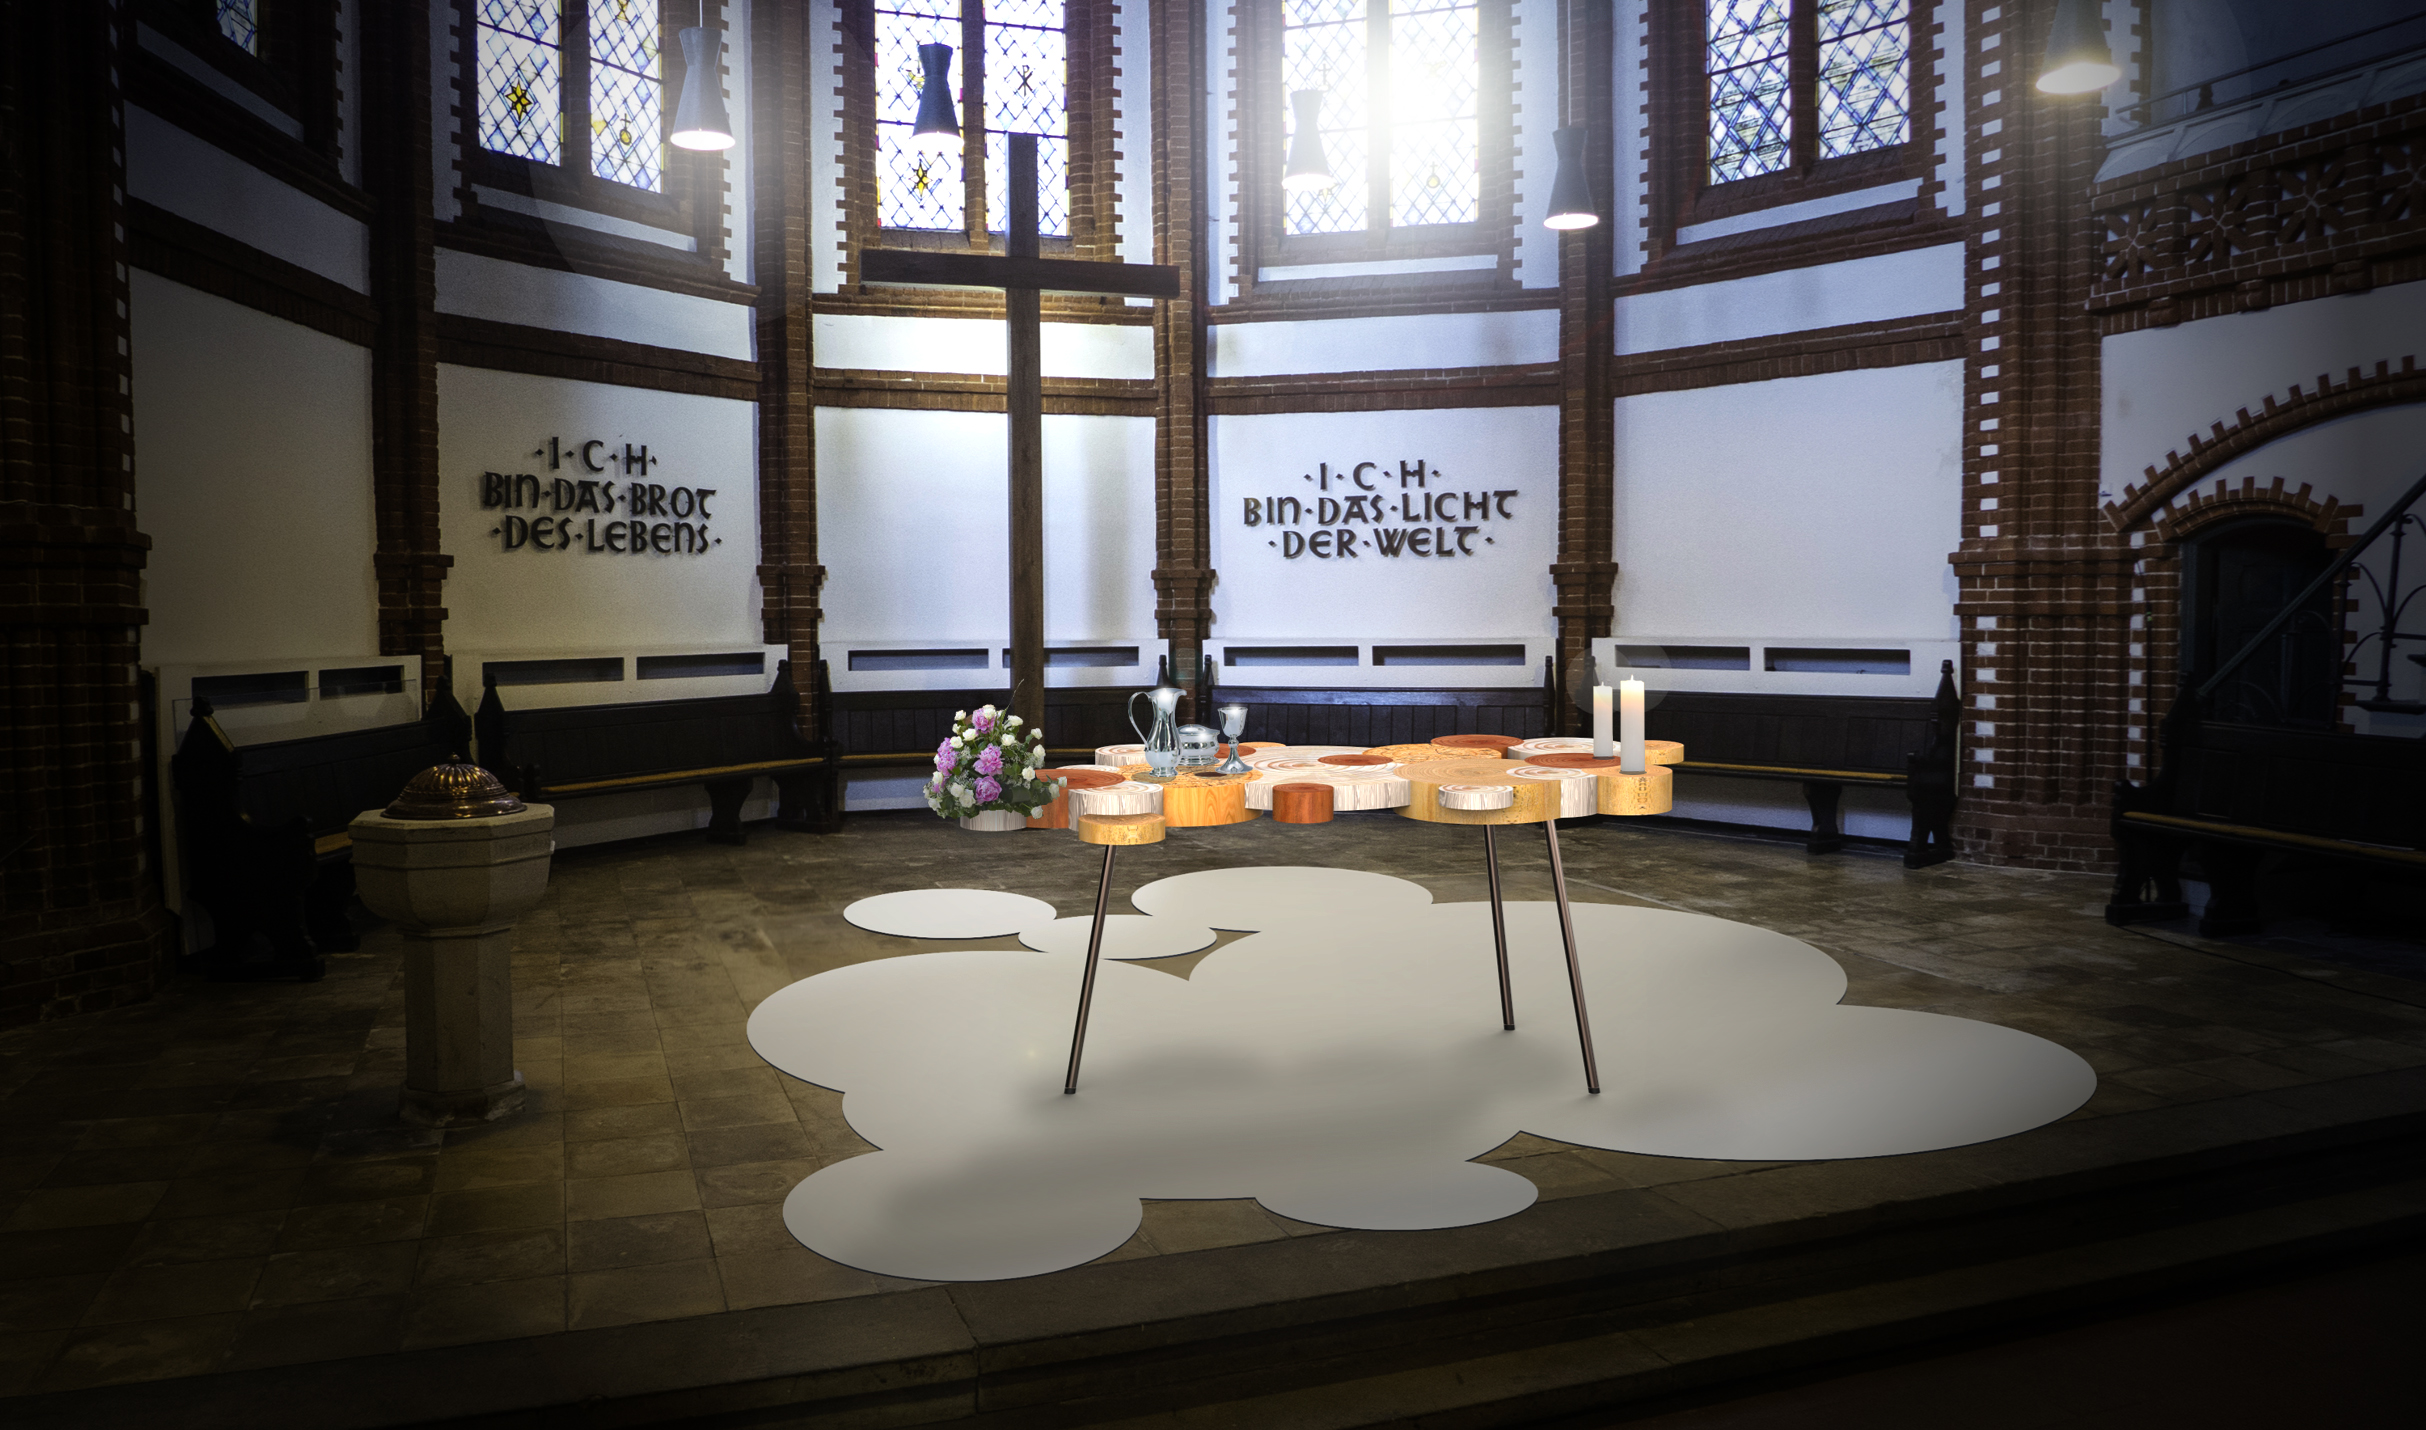 Perspektive_Tisch-gedeckt_Kirche